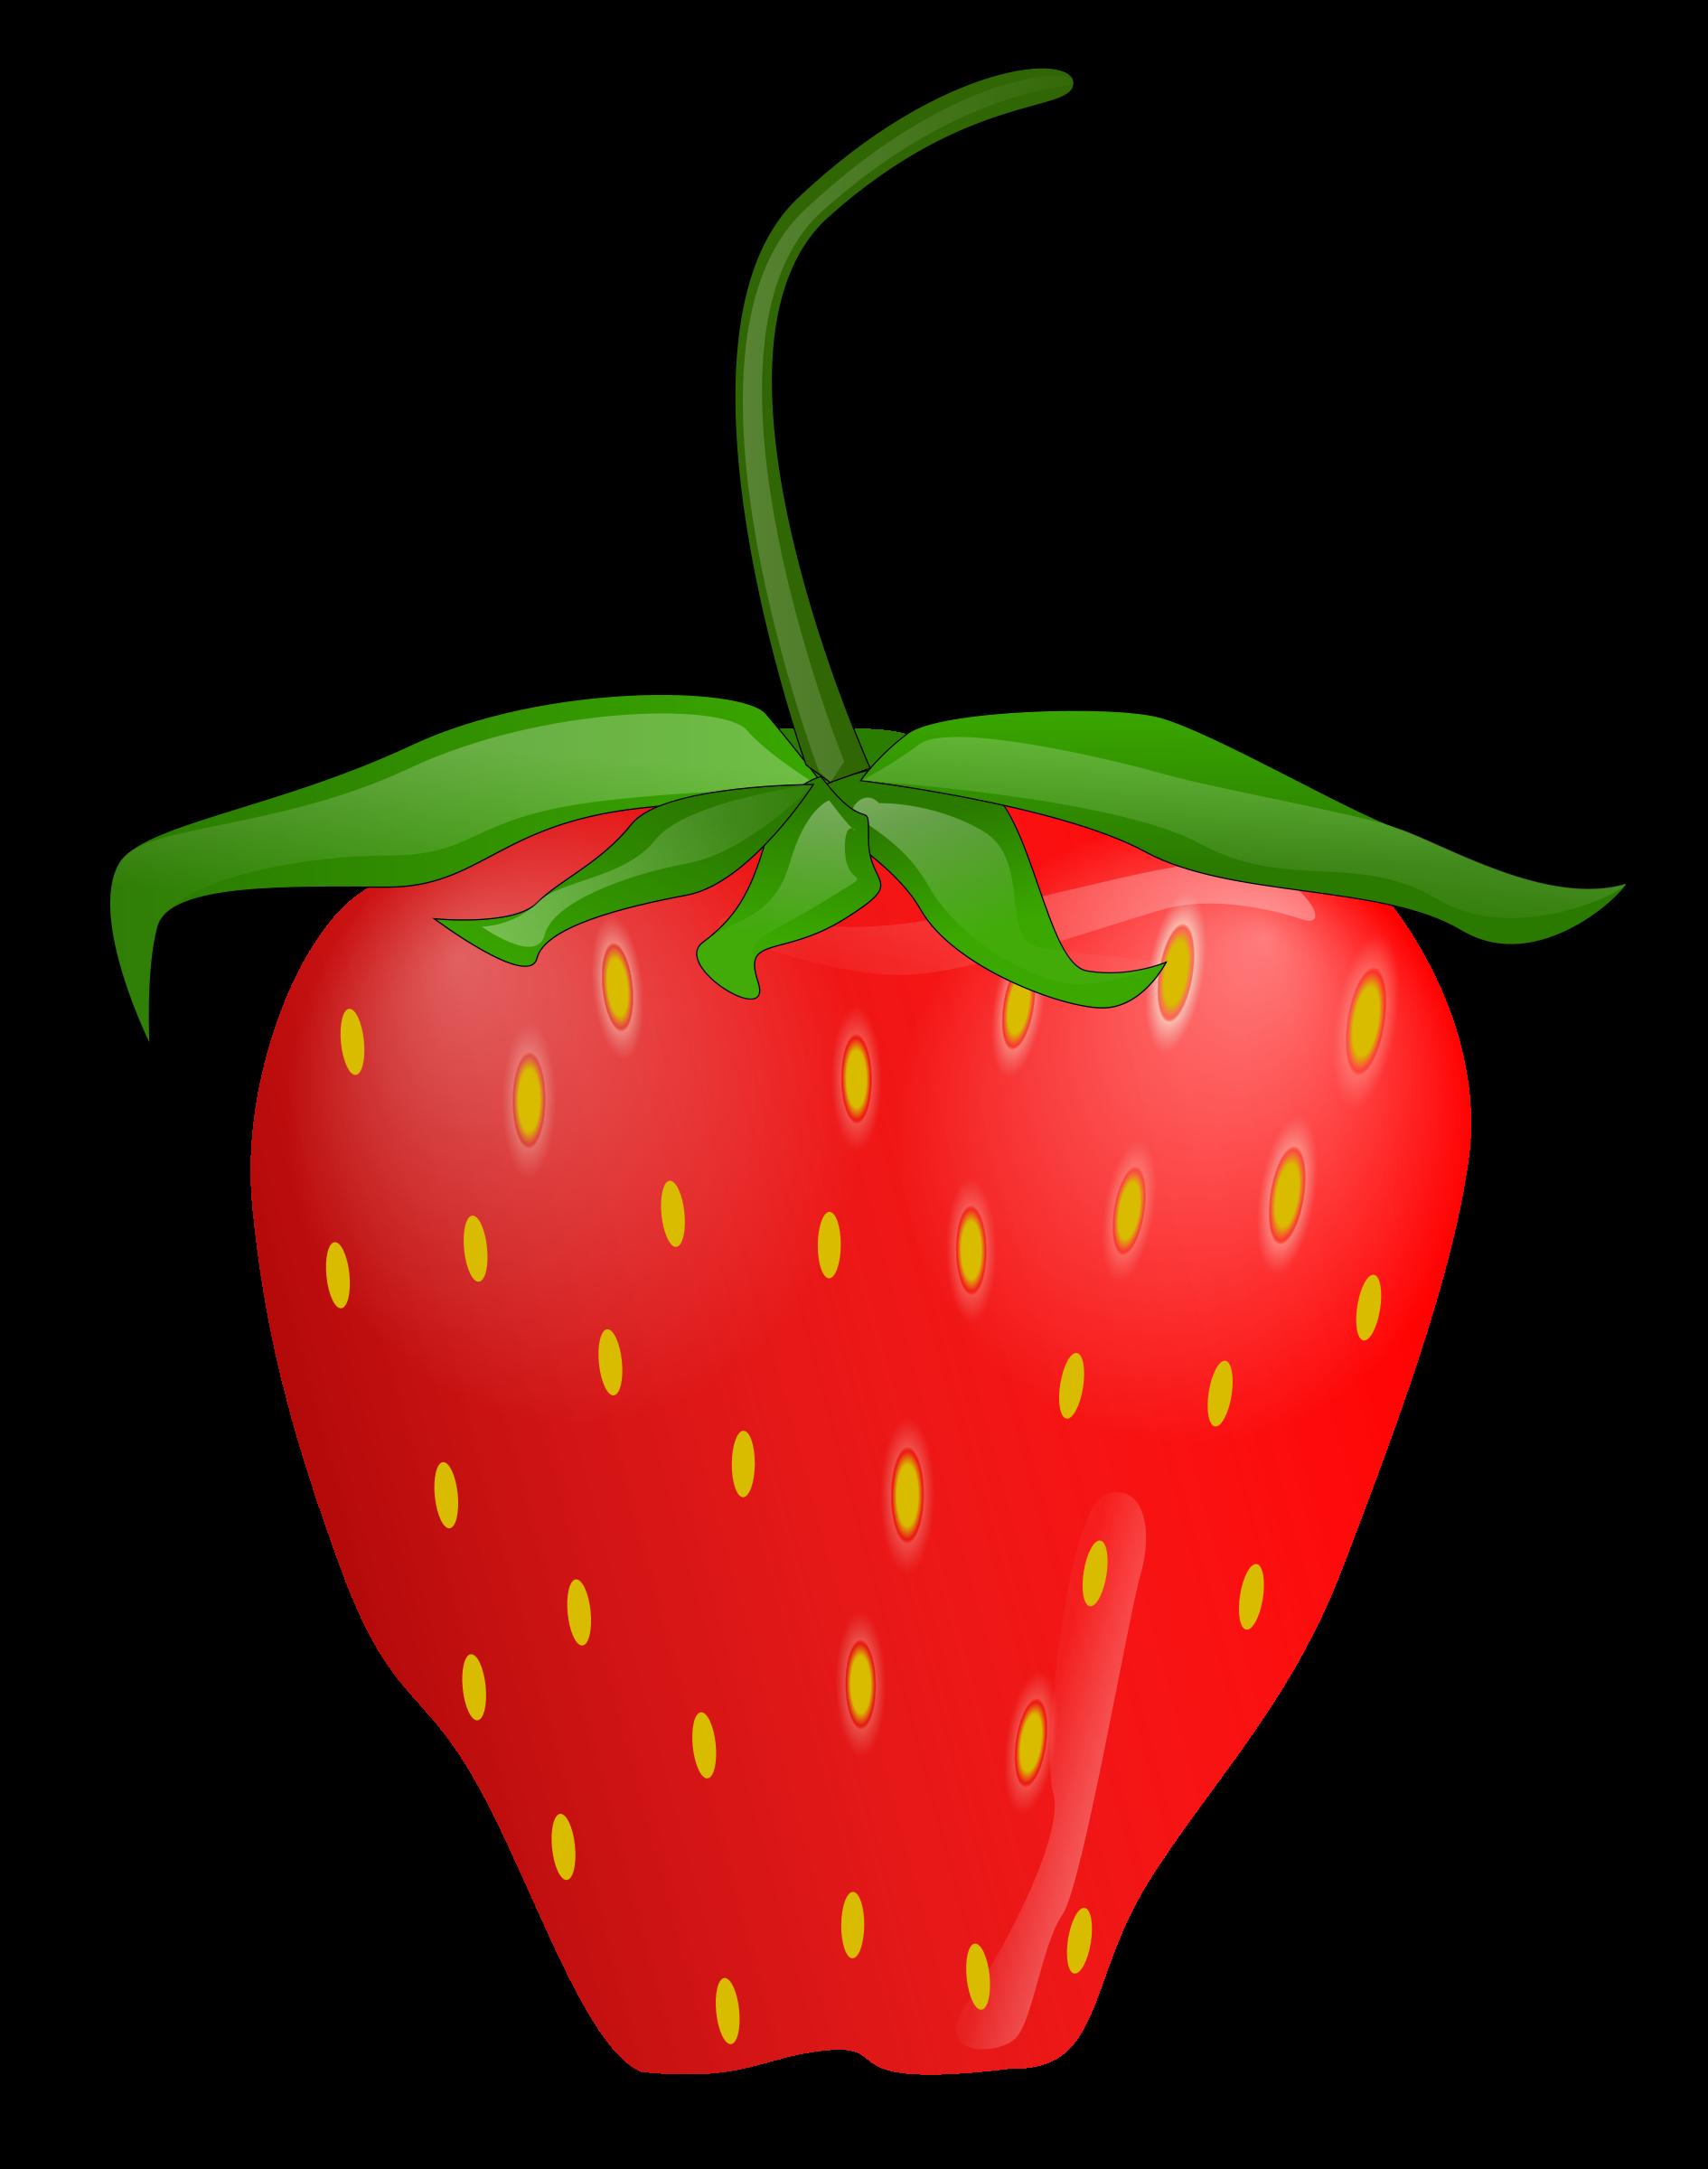 Berry clipart strawberry White Black Strawberry strawberry%20clipart Panda